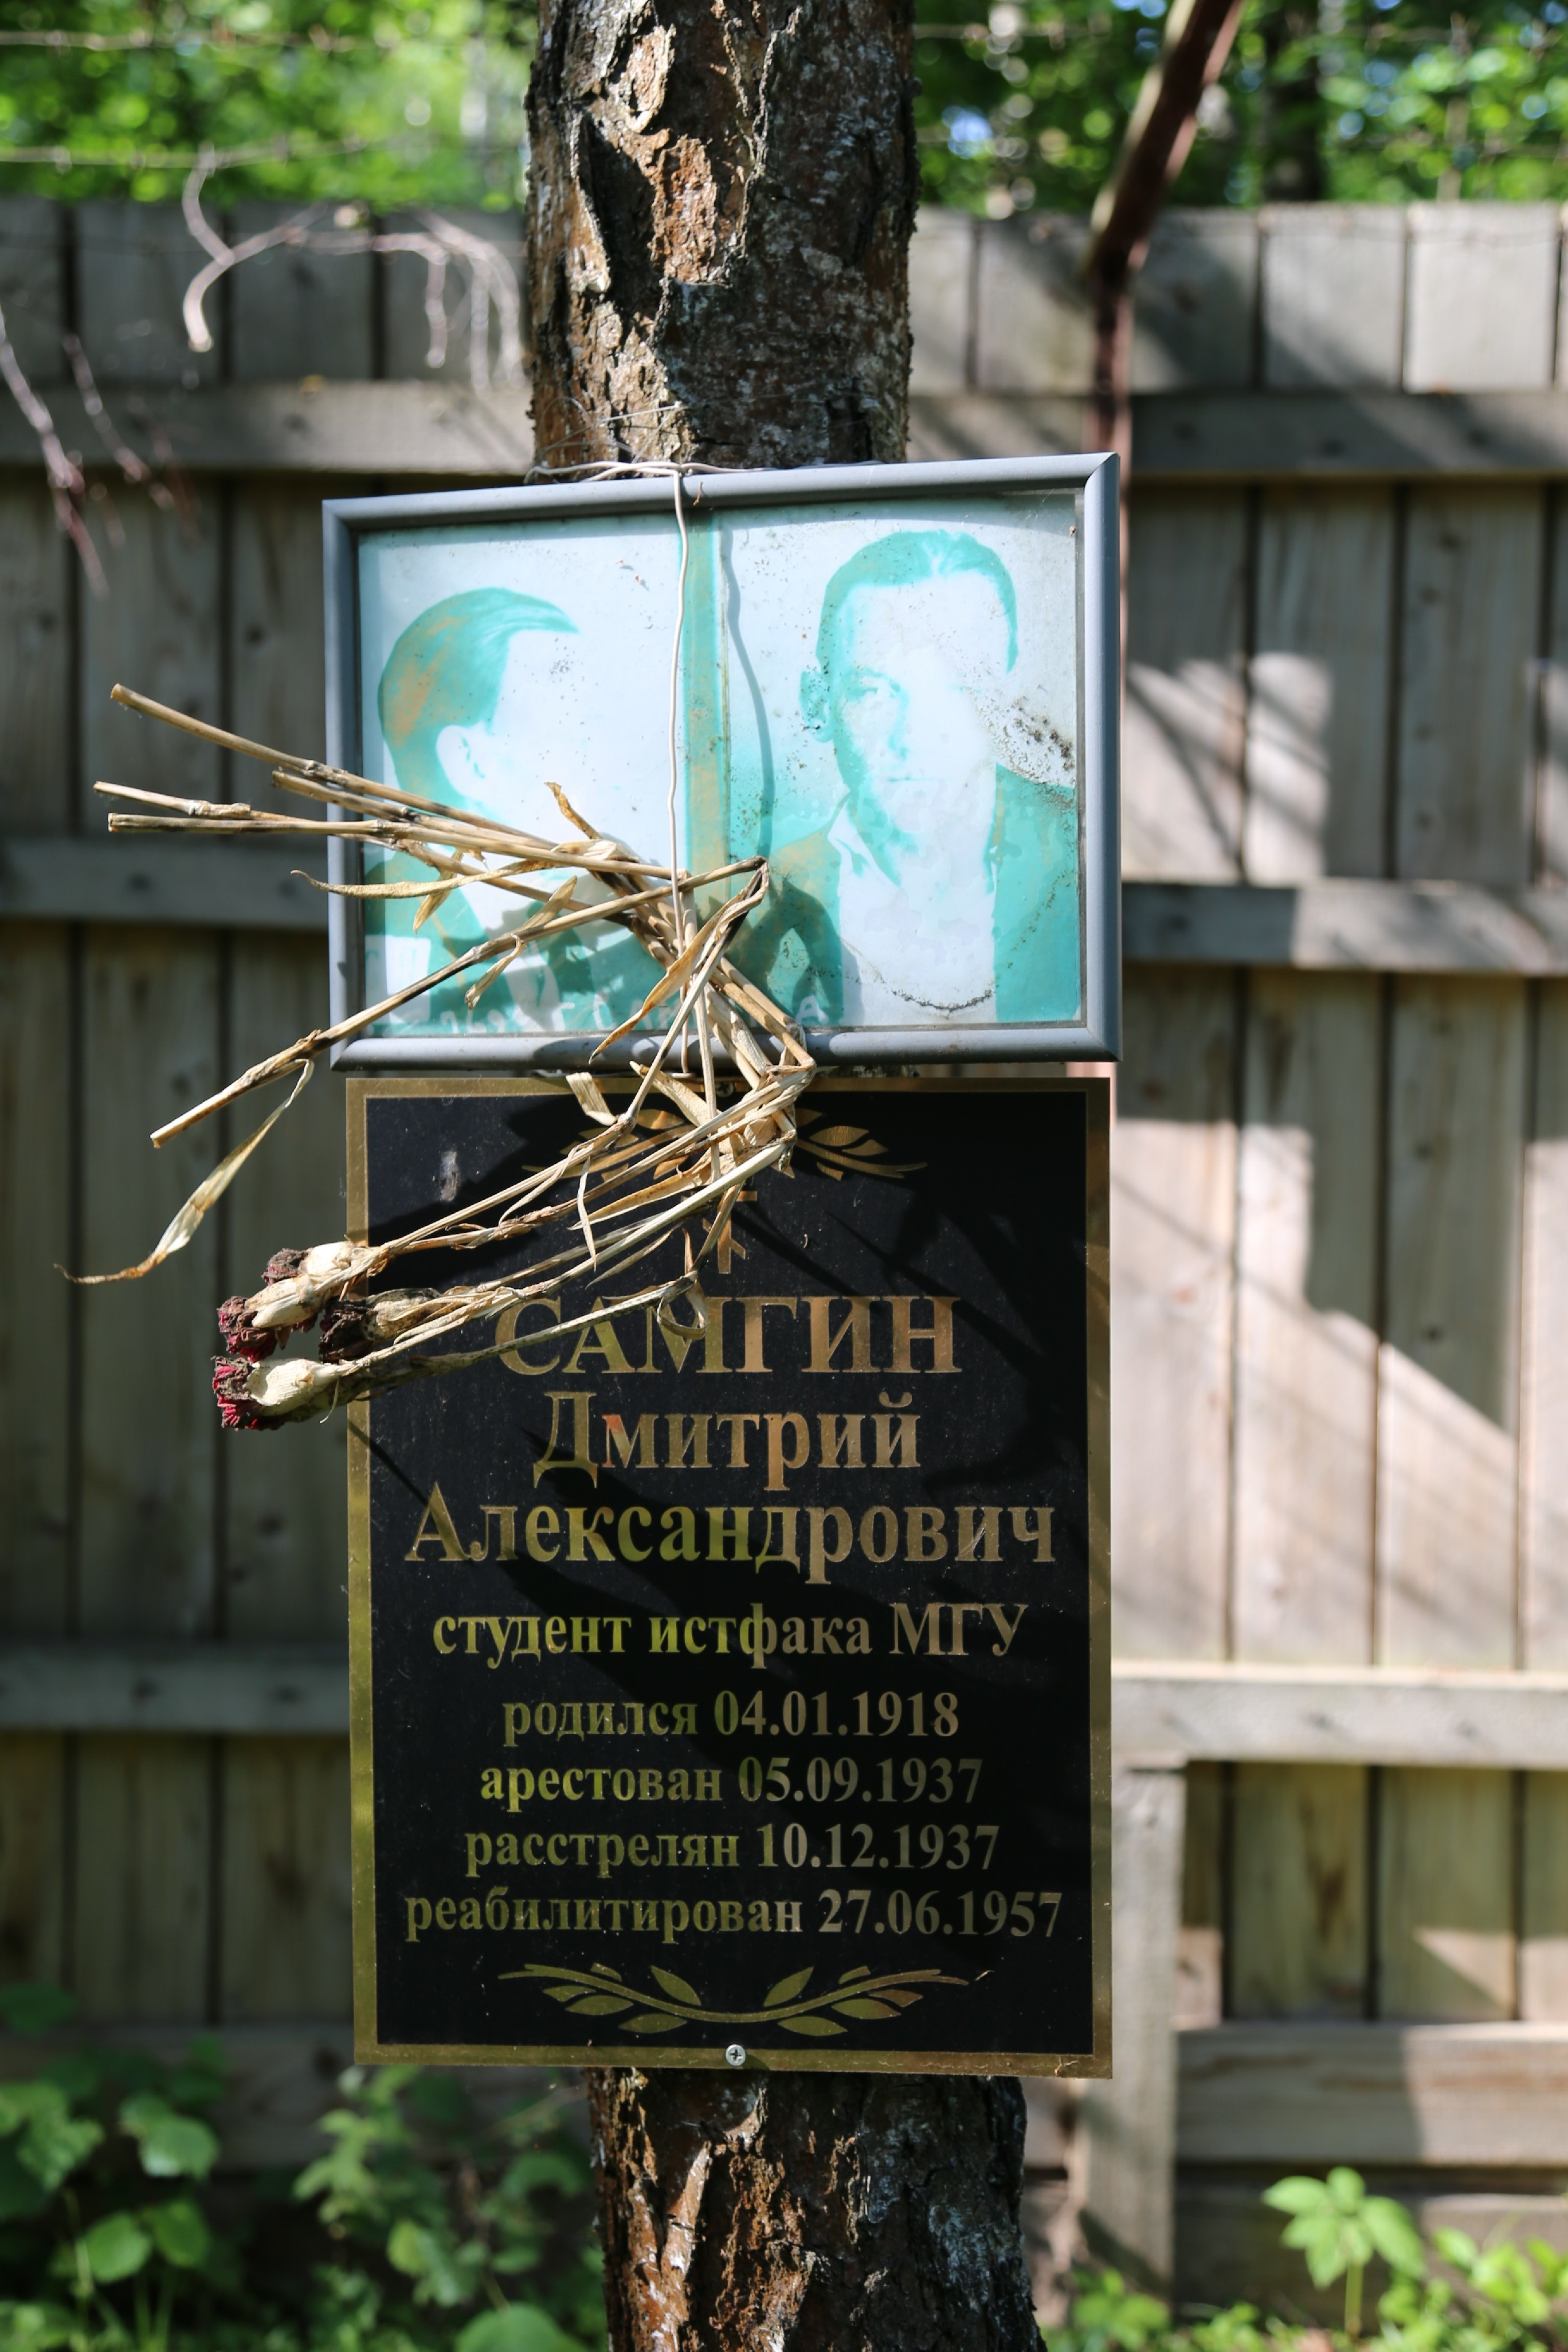 Памятная табличка Д.А. Самгину. Фото 22.06.2018.